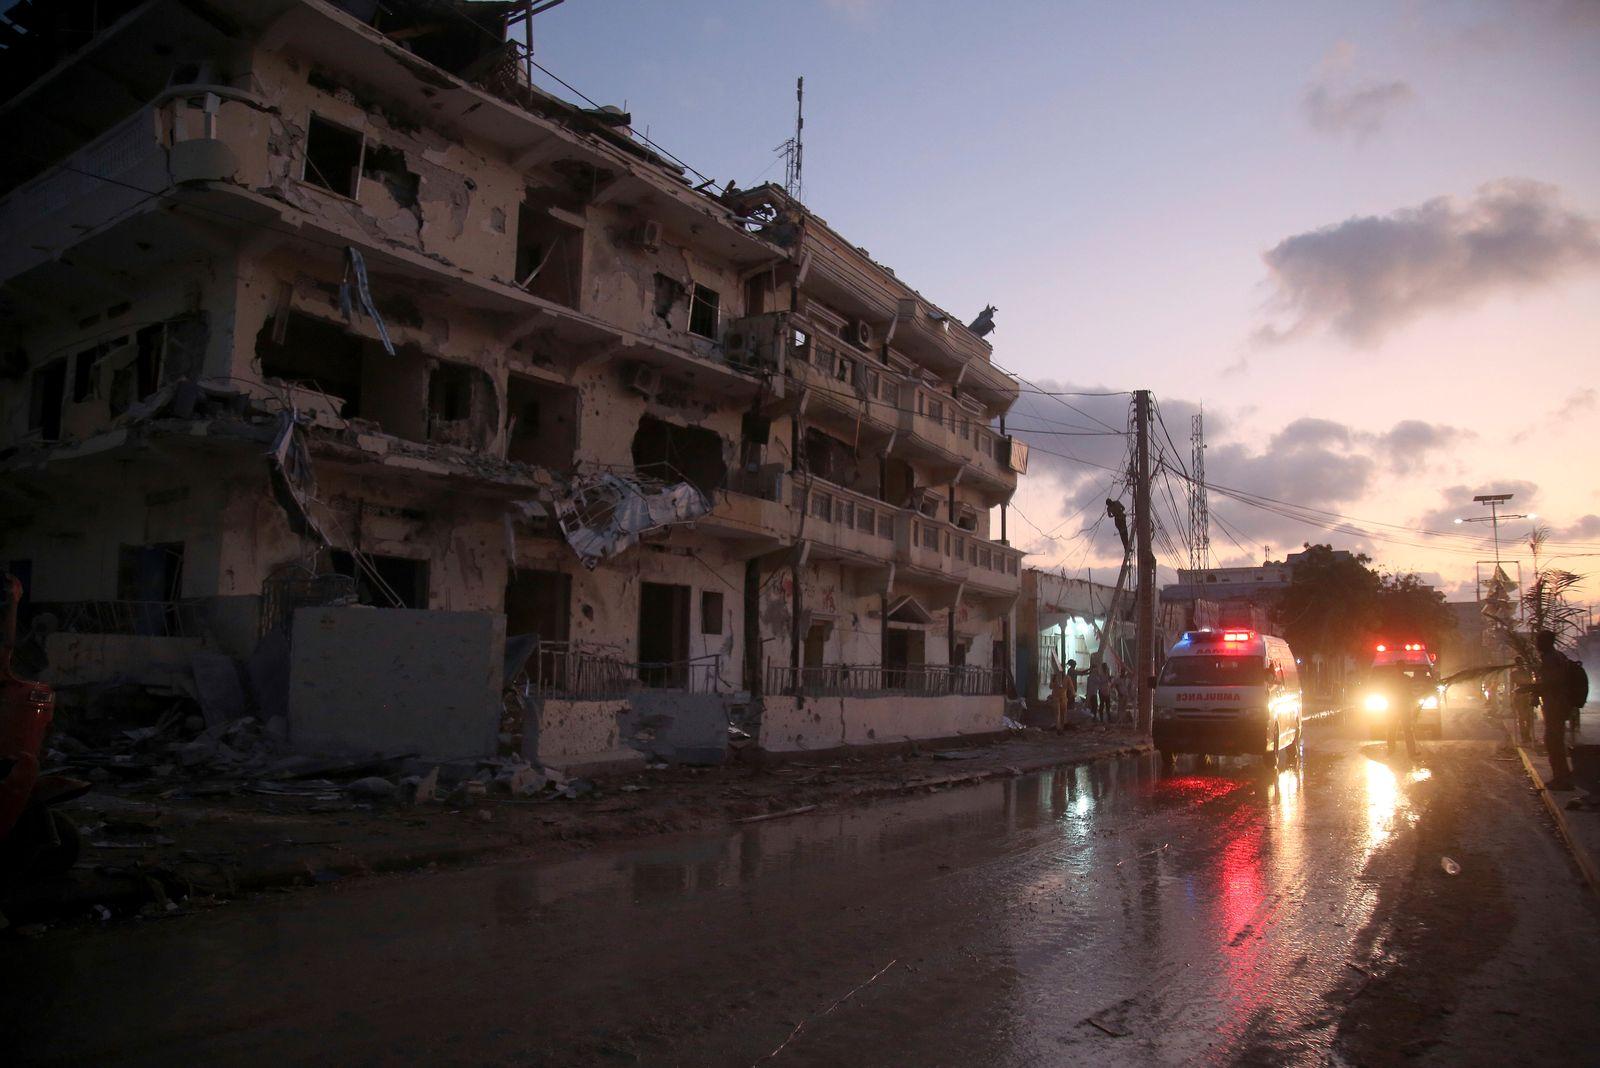 Bomb-laden vehicle attack in Somalia